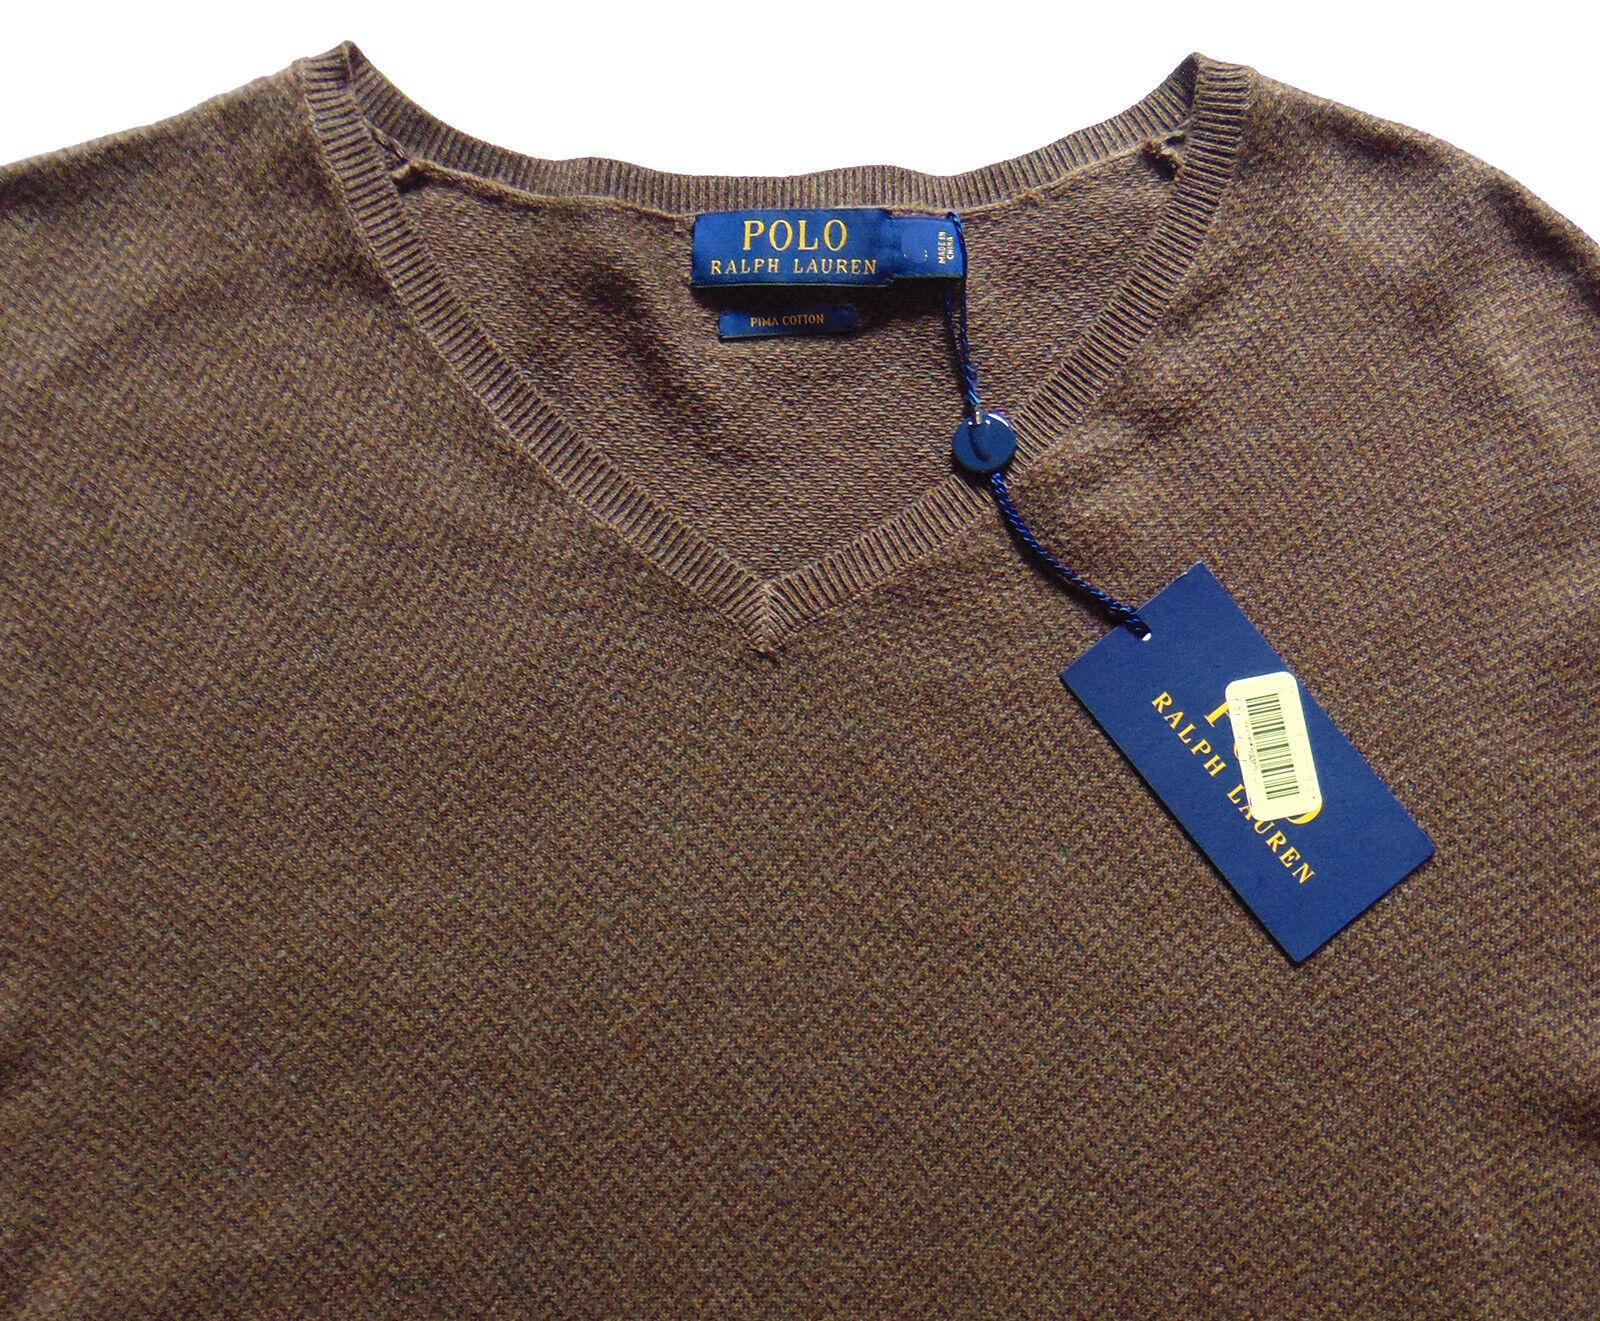 Men's POLO RALPH LAUREN Brown Herringbone Pima Cotton Sweater Large L NWT NEW